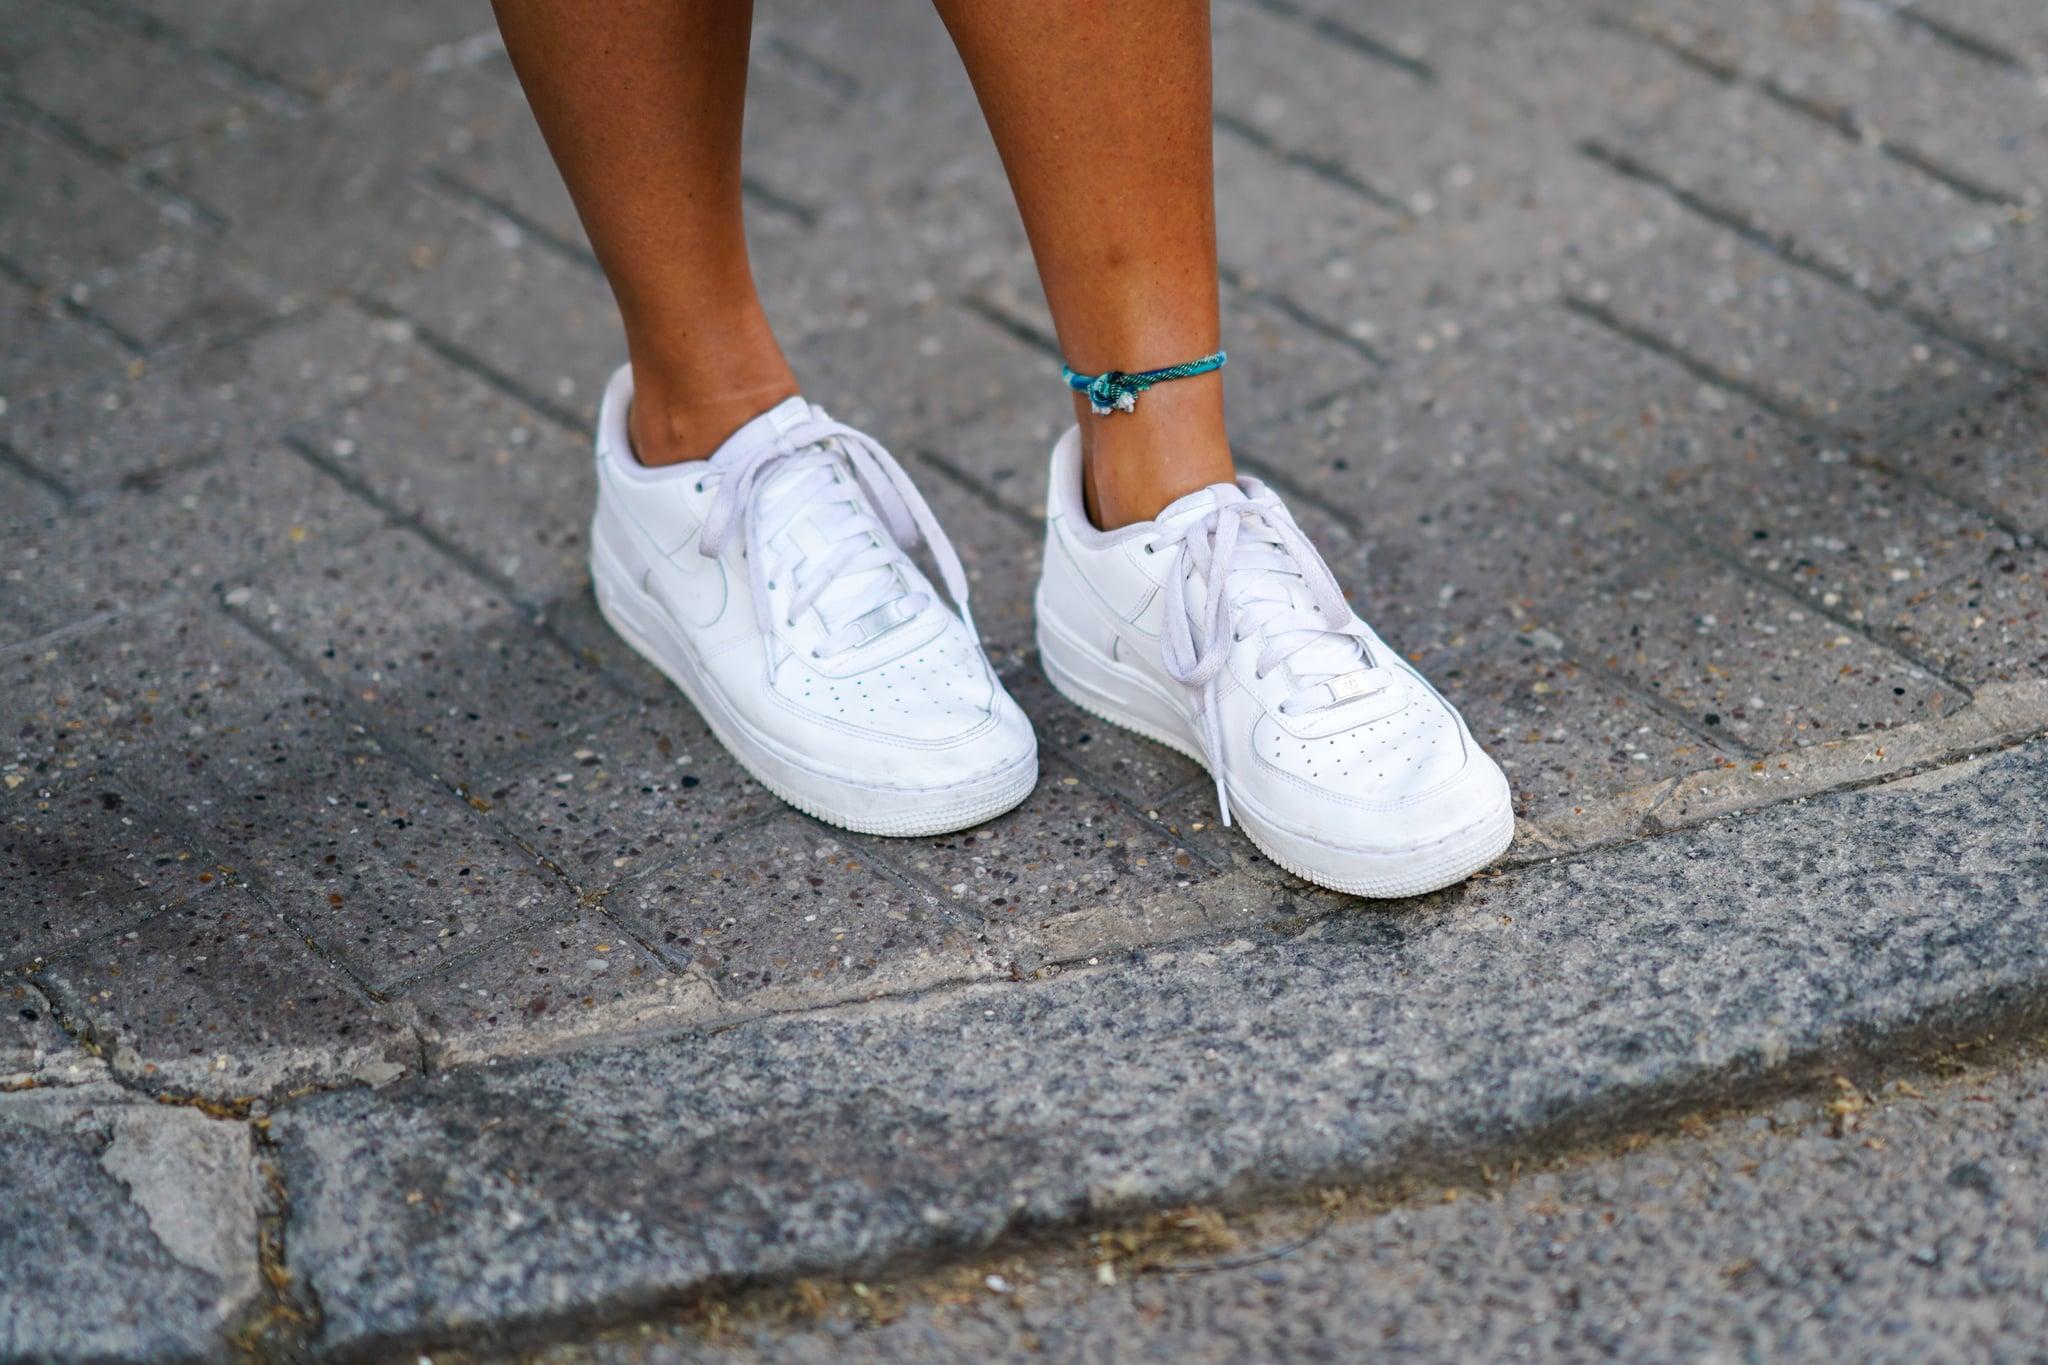 Best No-Show Socks For Women | POPSUGAR